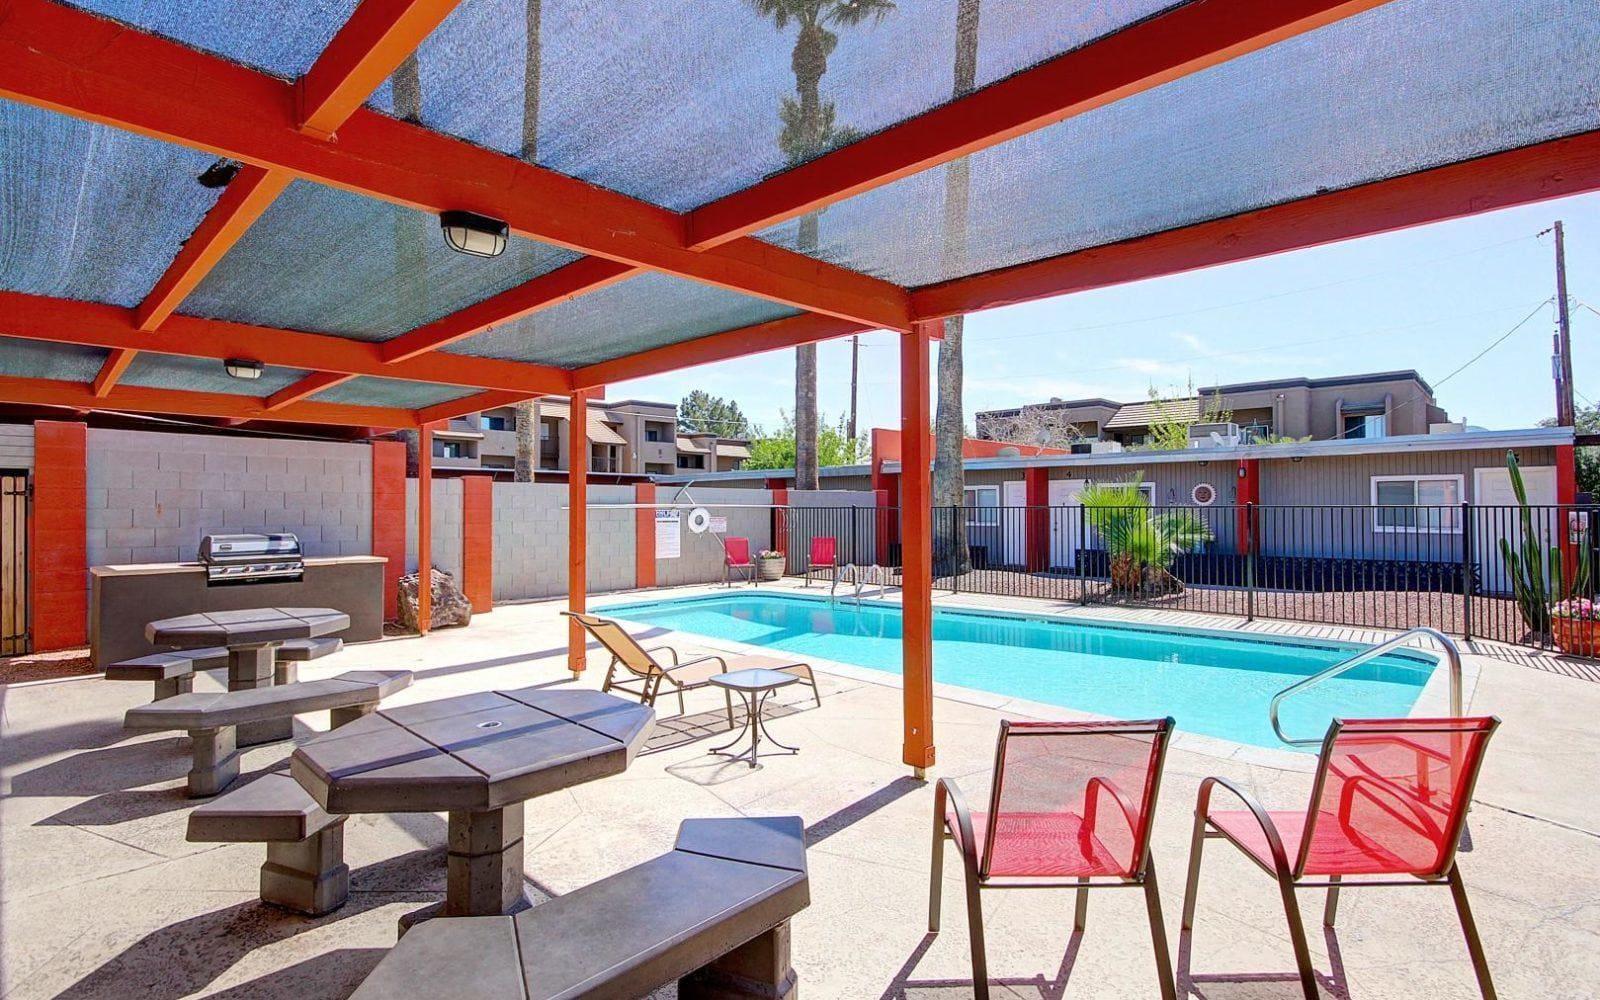 1717 W Missouri Ave #24, Phoenix, AZ - 1,150 USD/ month